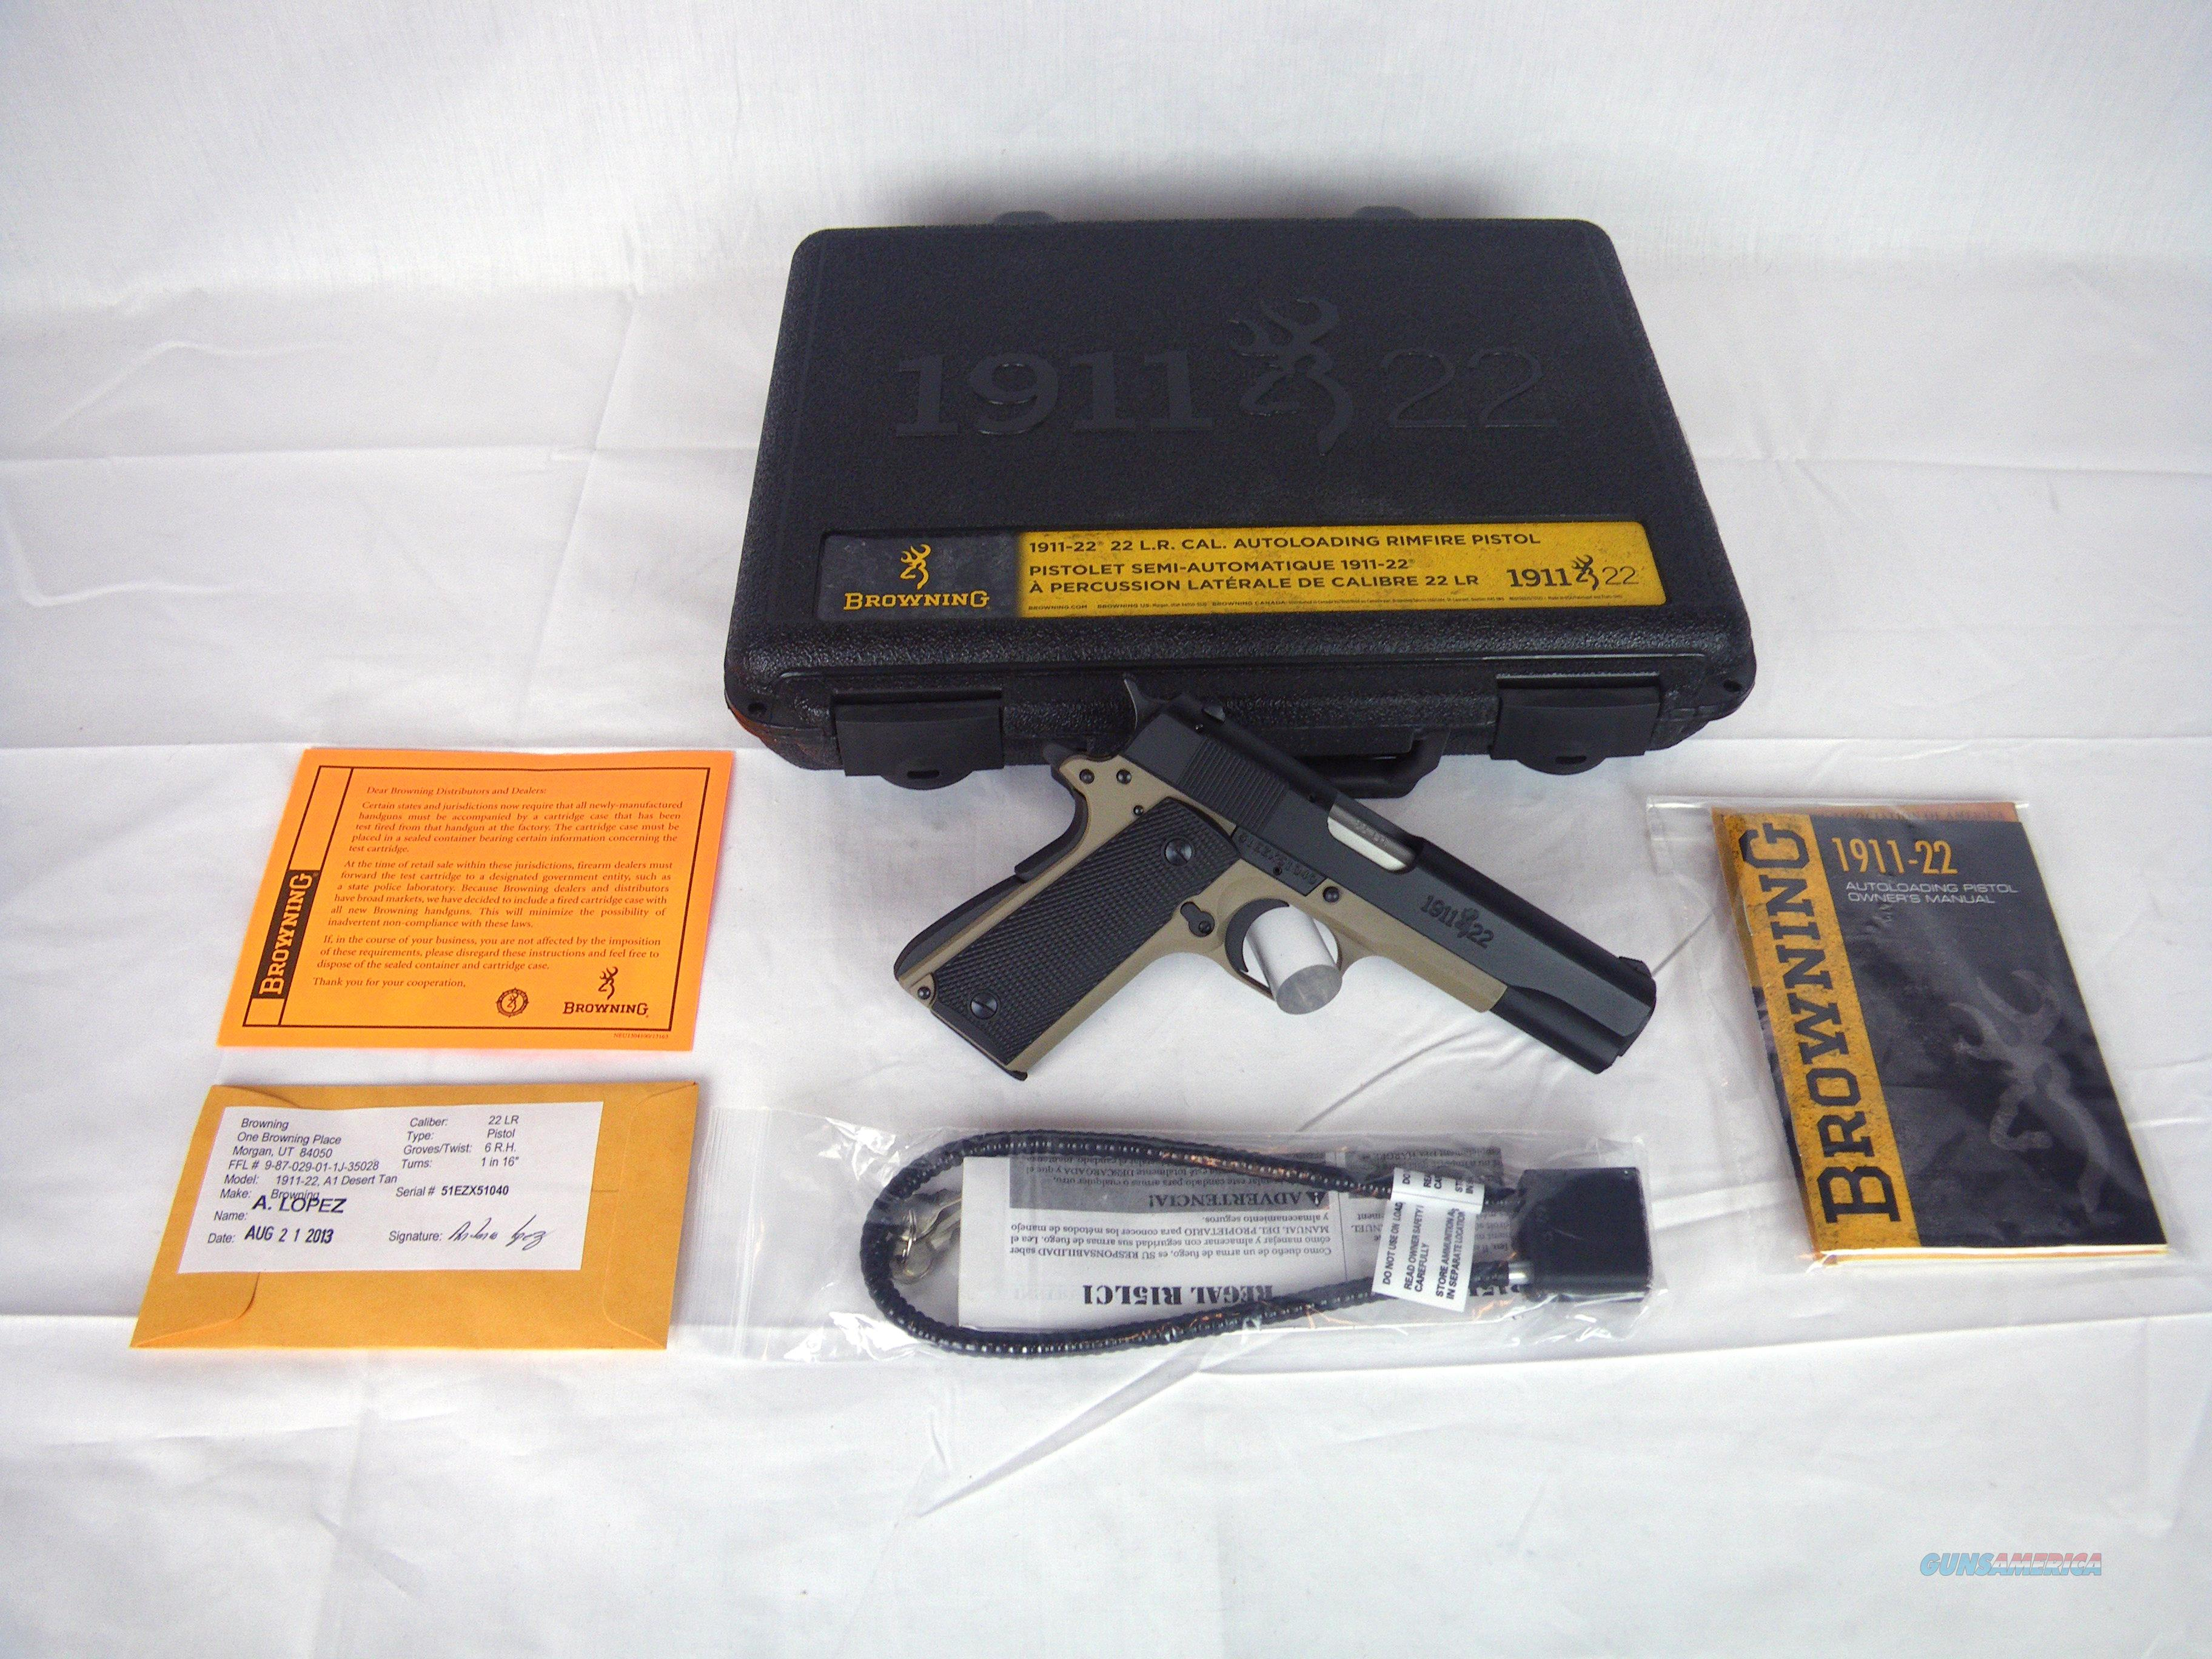 "Browning 1911-22 A1 Desert Tan 22lr 4.25"" NEW NIB #051808490  Guns > Pistols > Browning Pistols > Other Autos"